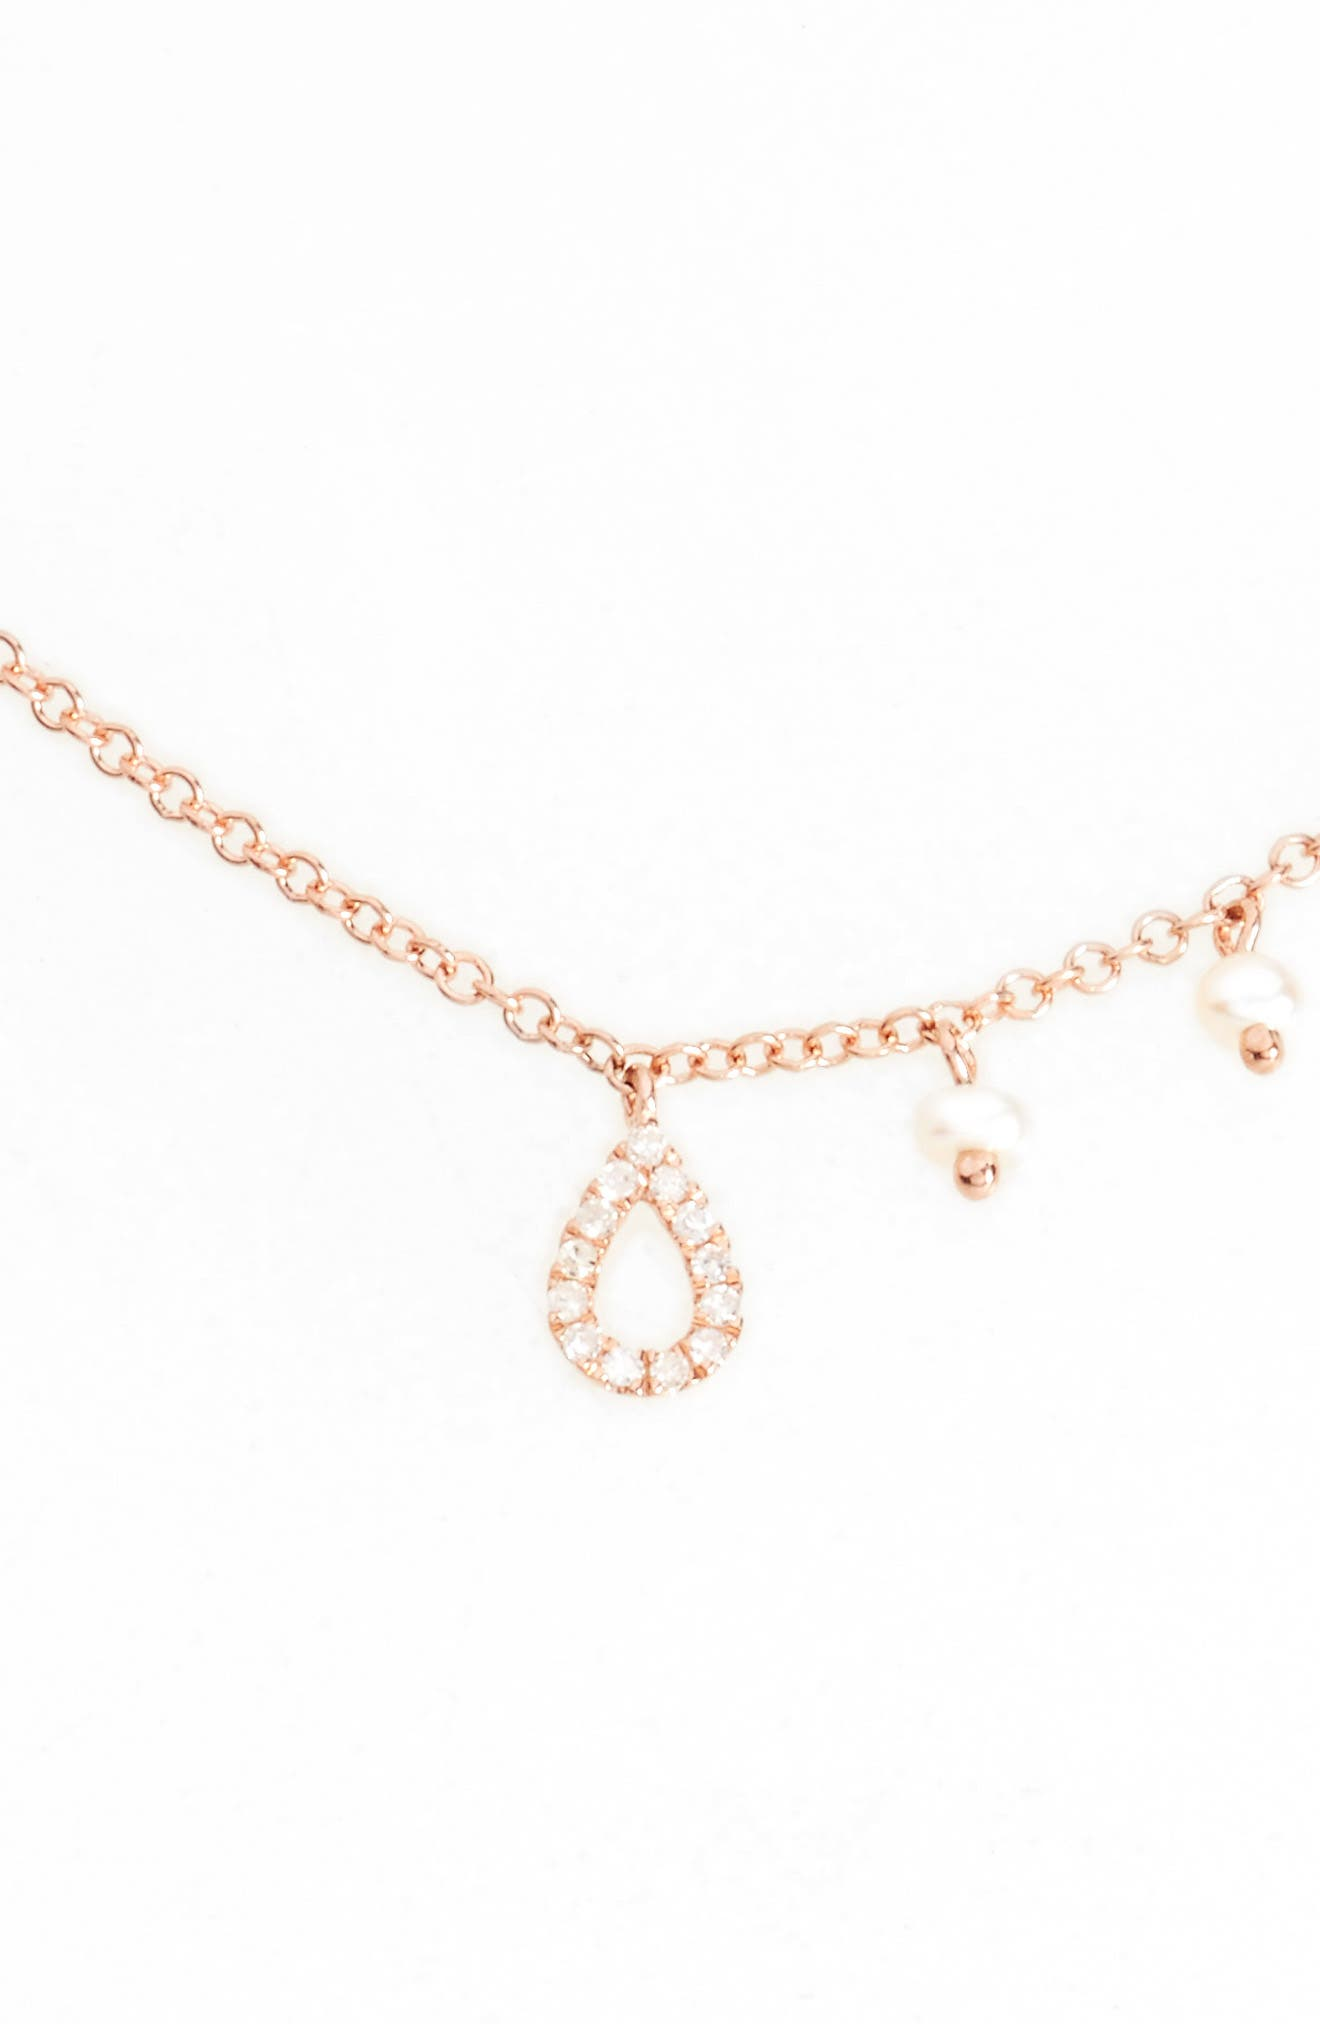 Diamond Teardrop Charm Collar Necklace,                         Main,                         color, ROSE GOLD